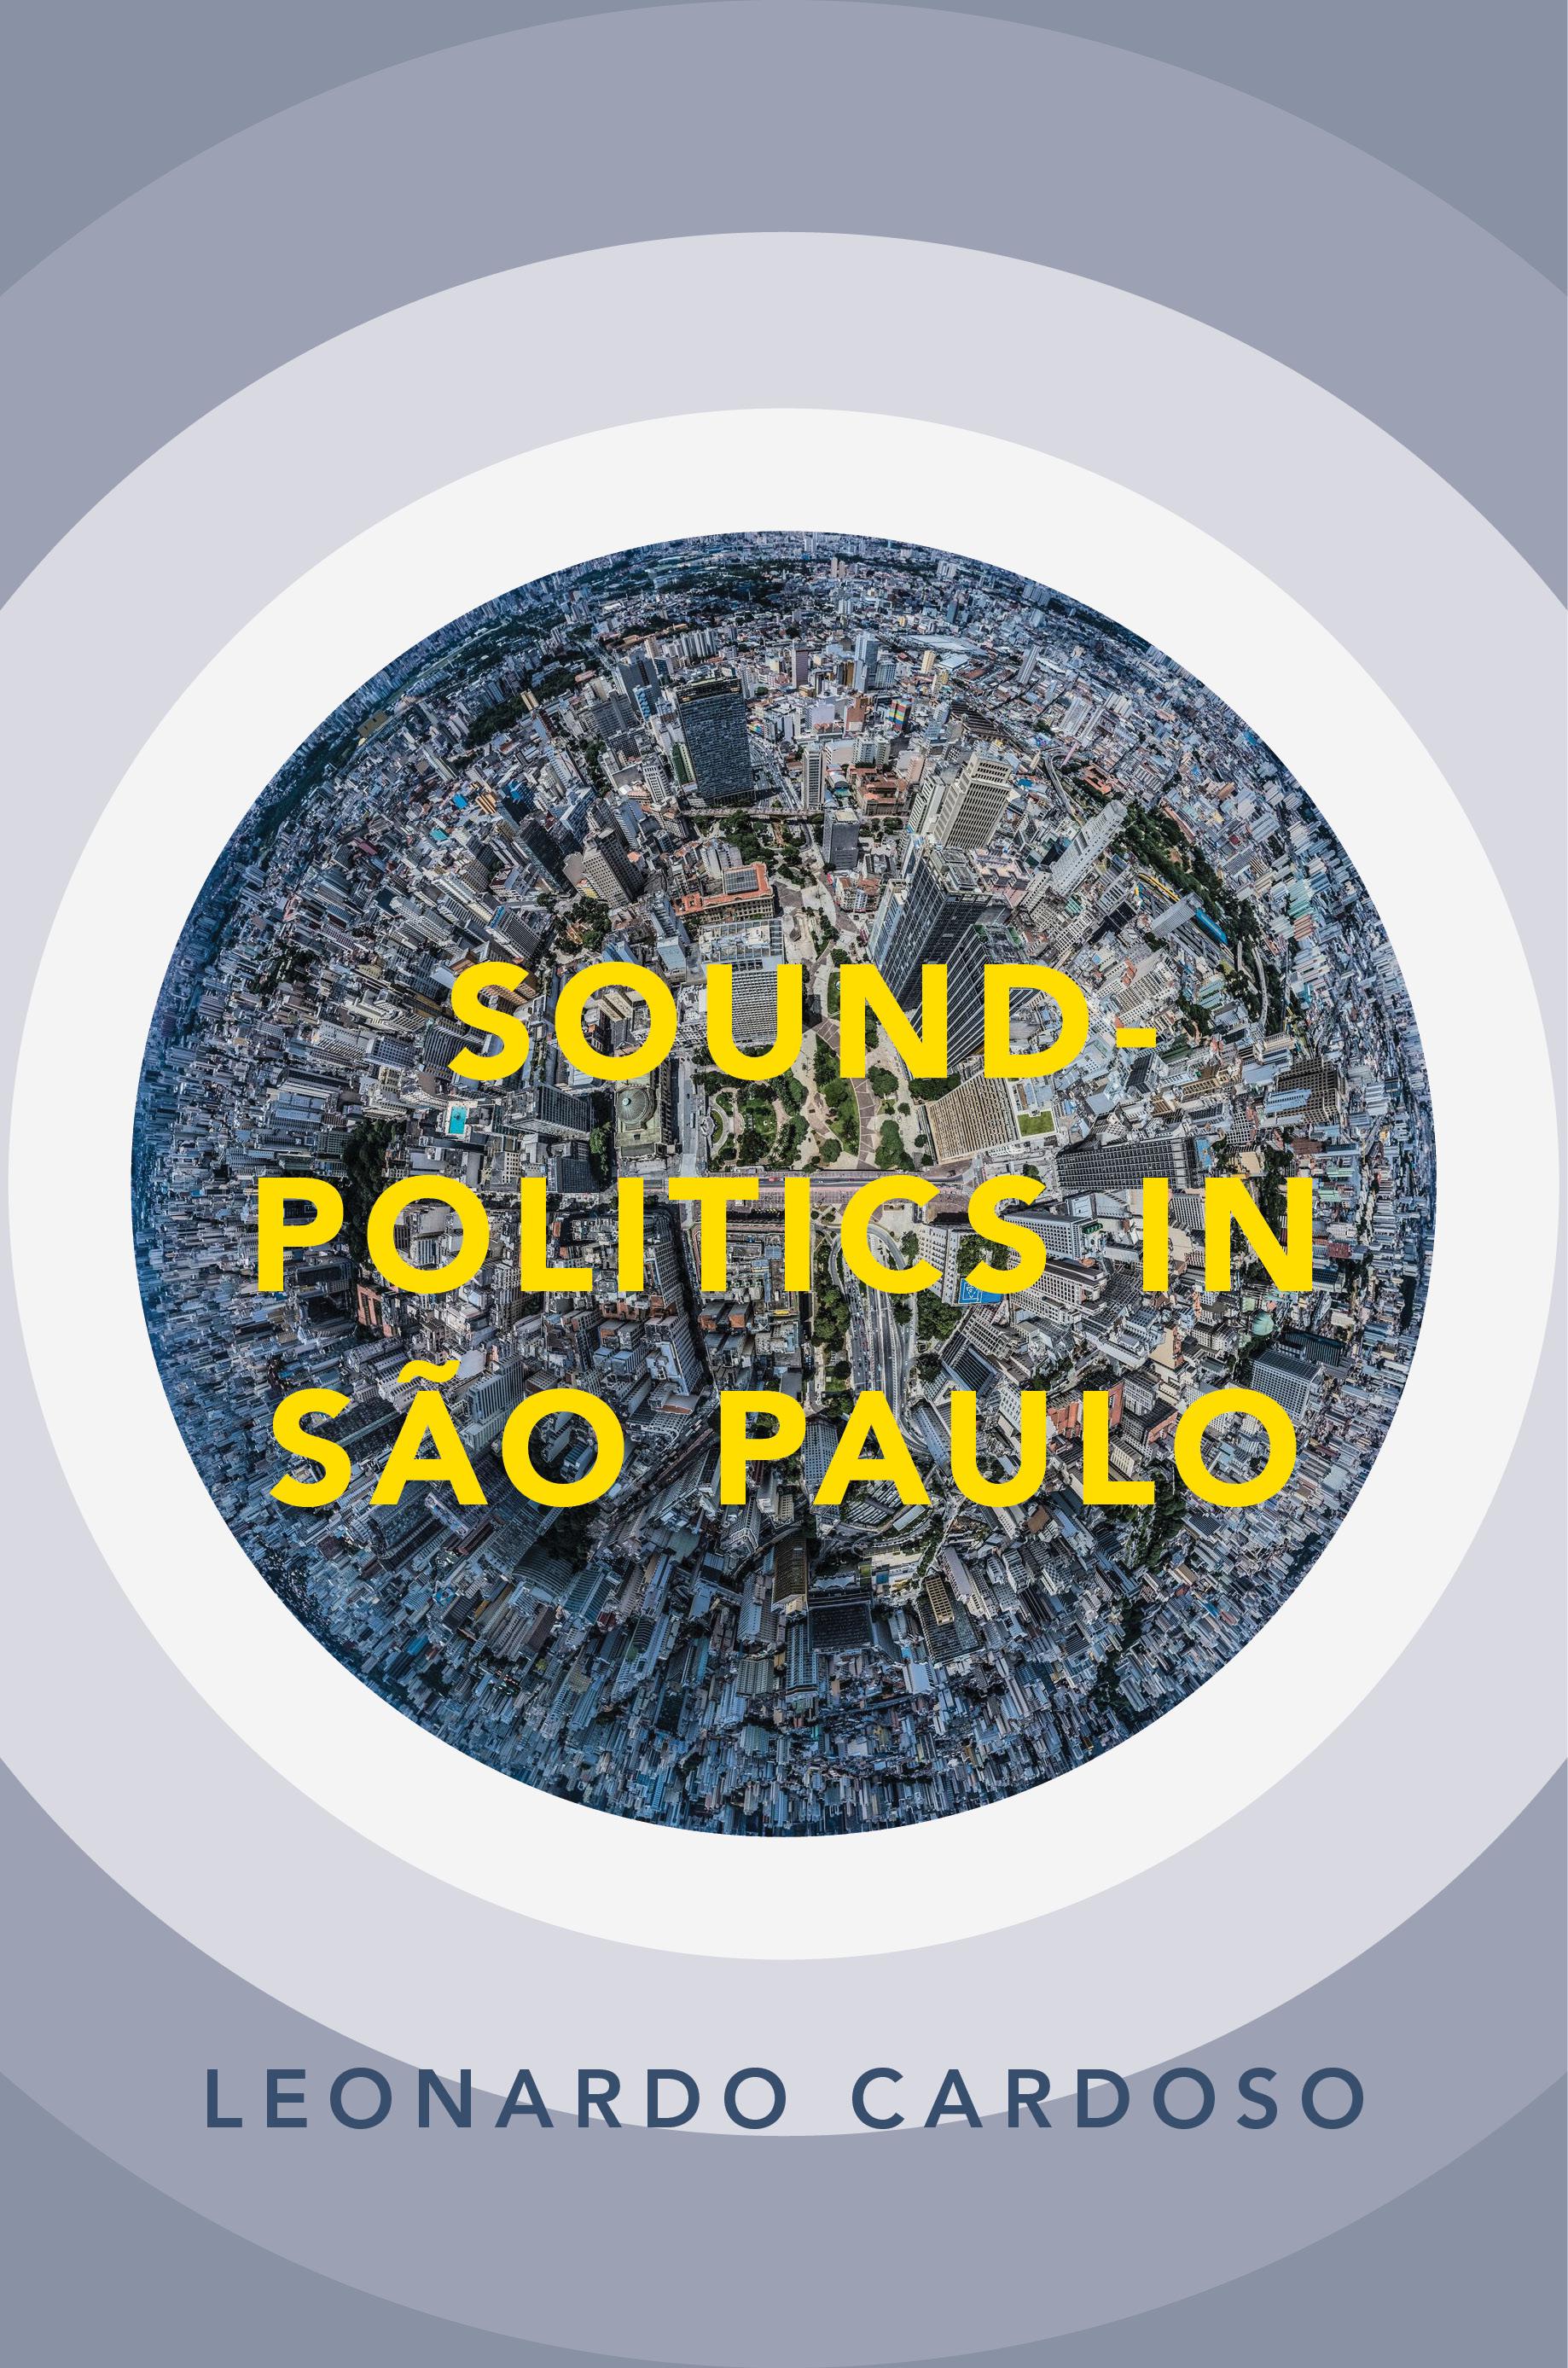 comp_R2_Cardoso_SoundPoliticsSaoPaulo.jpg